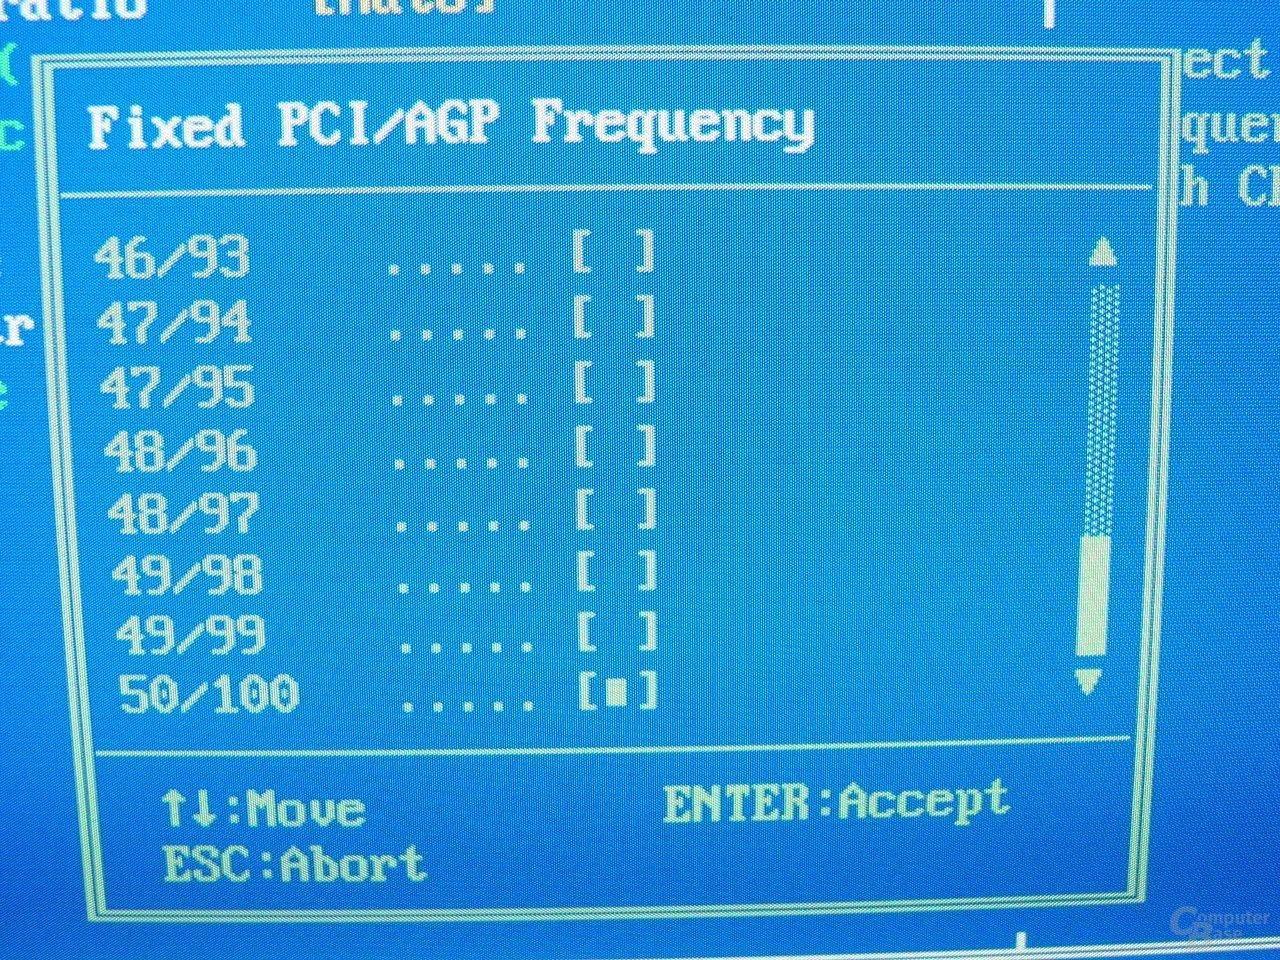 GA-8PE667 Ultra 2 - BIOS - PCi-AGP-Fix2